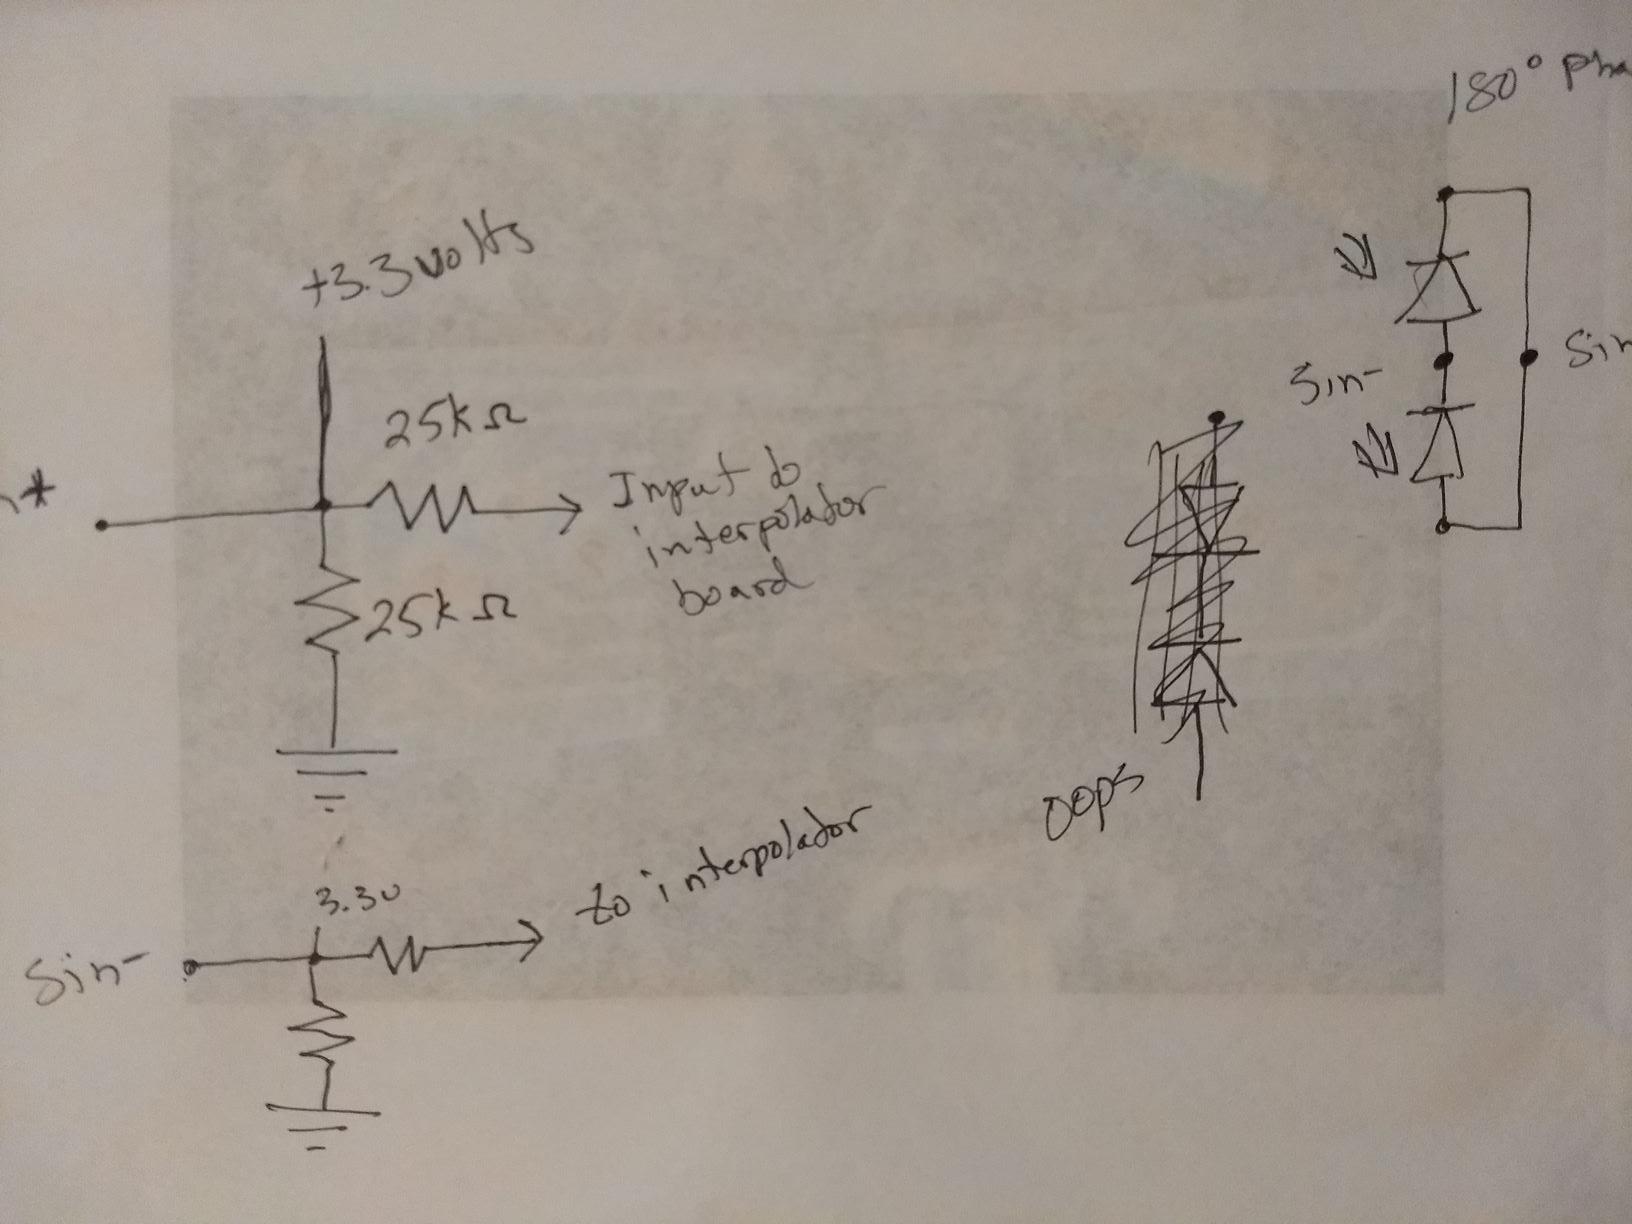 deckel maho nc integration linuxcncphotodiode res jpg